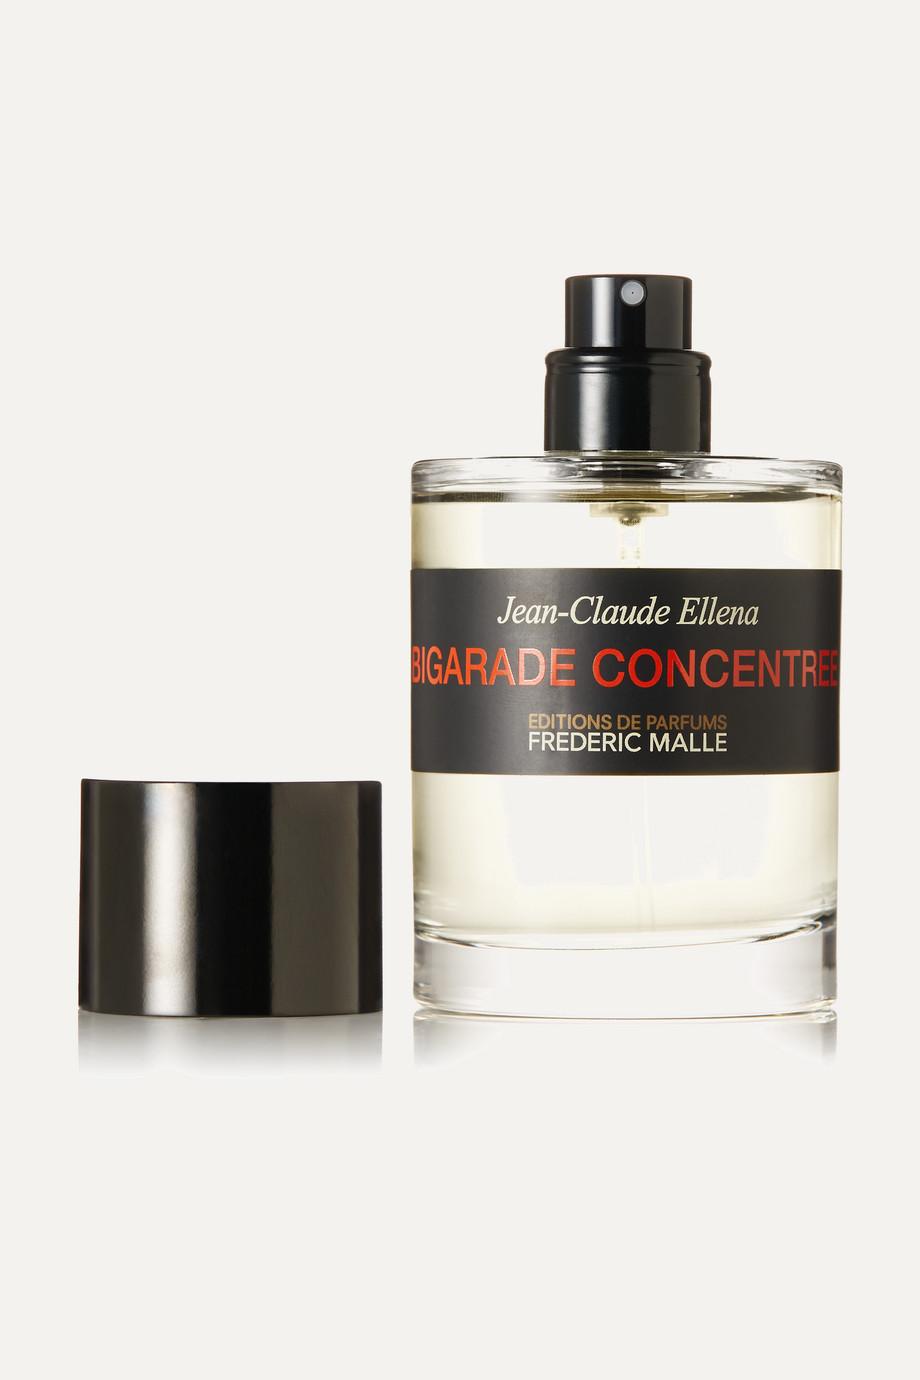 Frederic Malle Bigarade Concentree Eau de Parfum - Bitter Orange & Cedar, 100ml